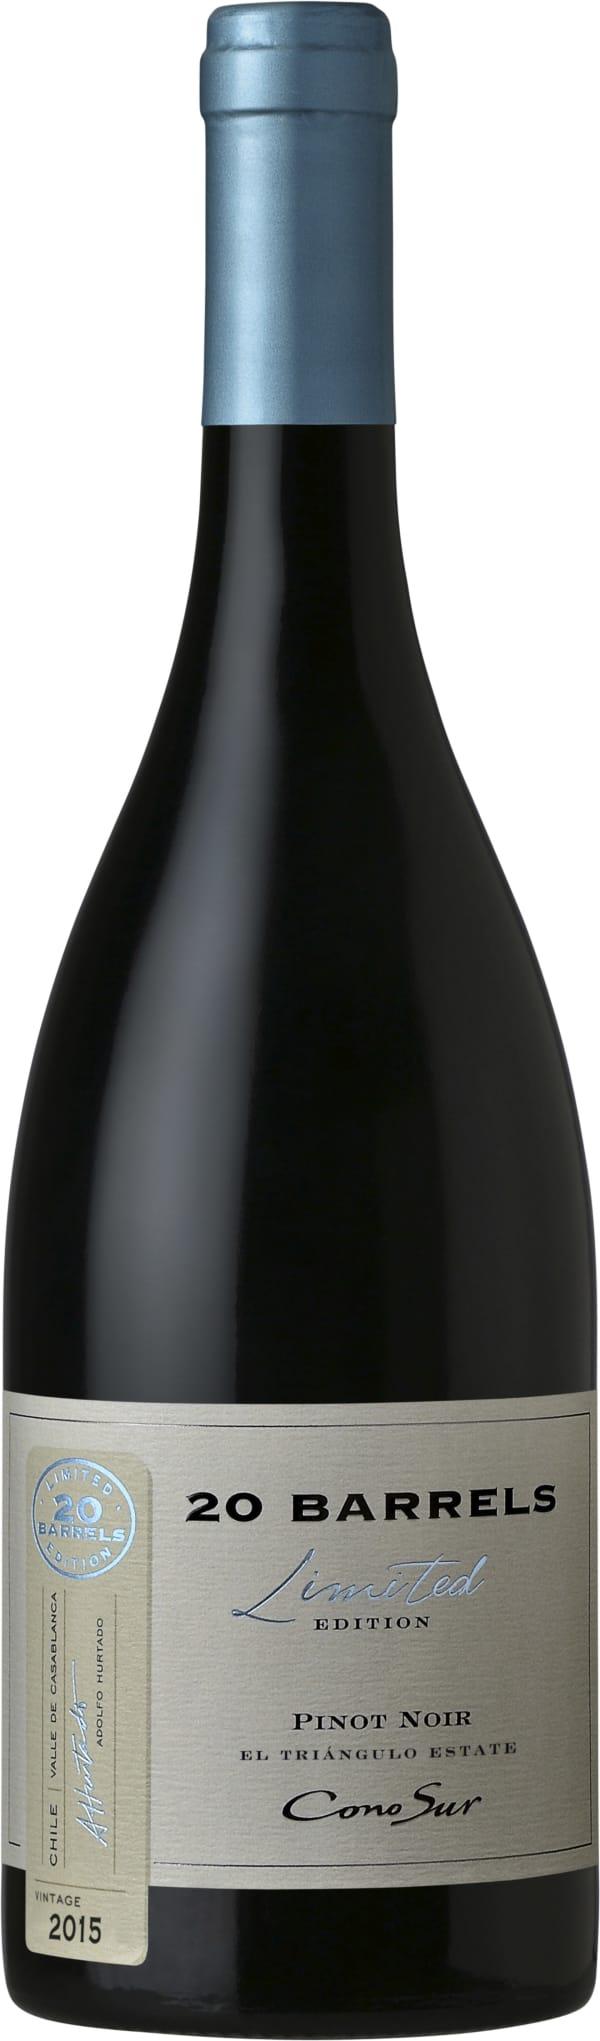 Cono Sur 20 Barrels Pinot Noir 2014